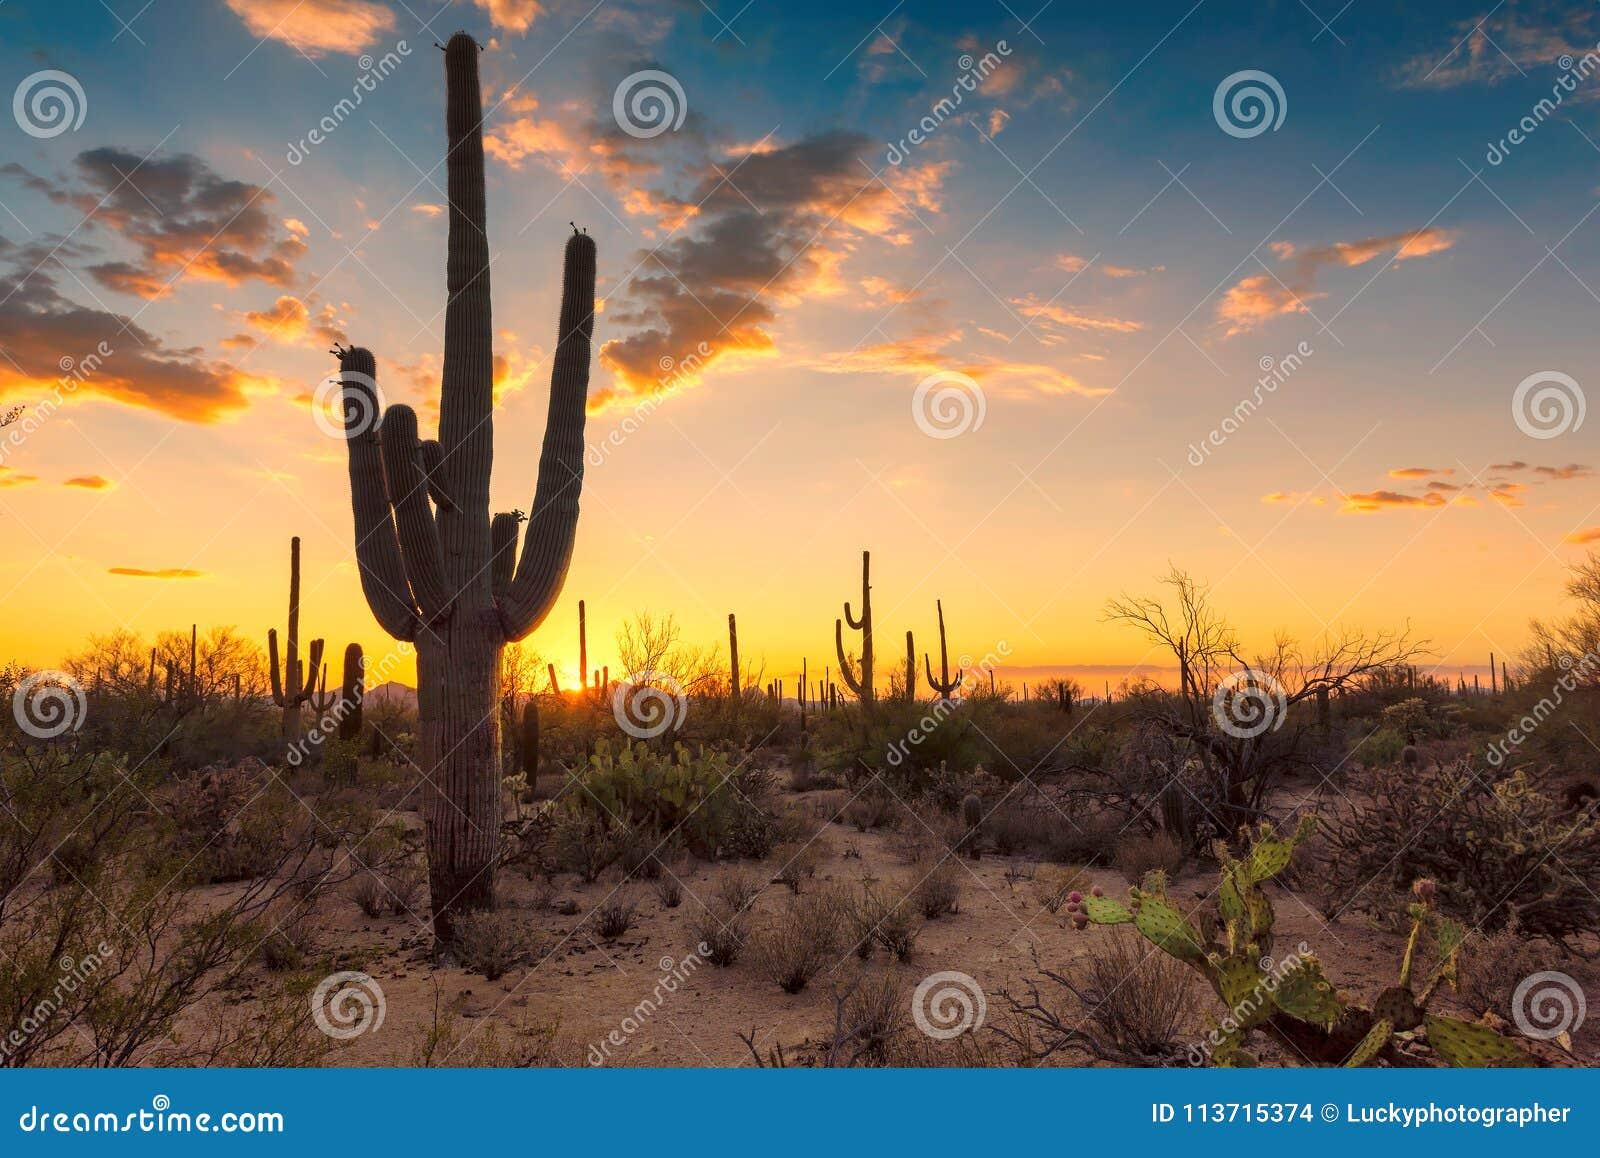 Saguaro Cactus at Sunset in Sonoran Desert